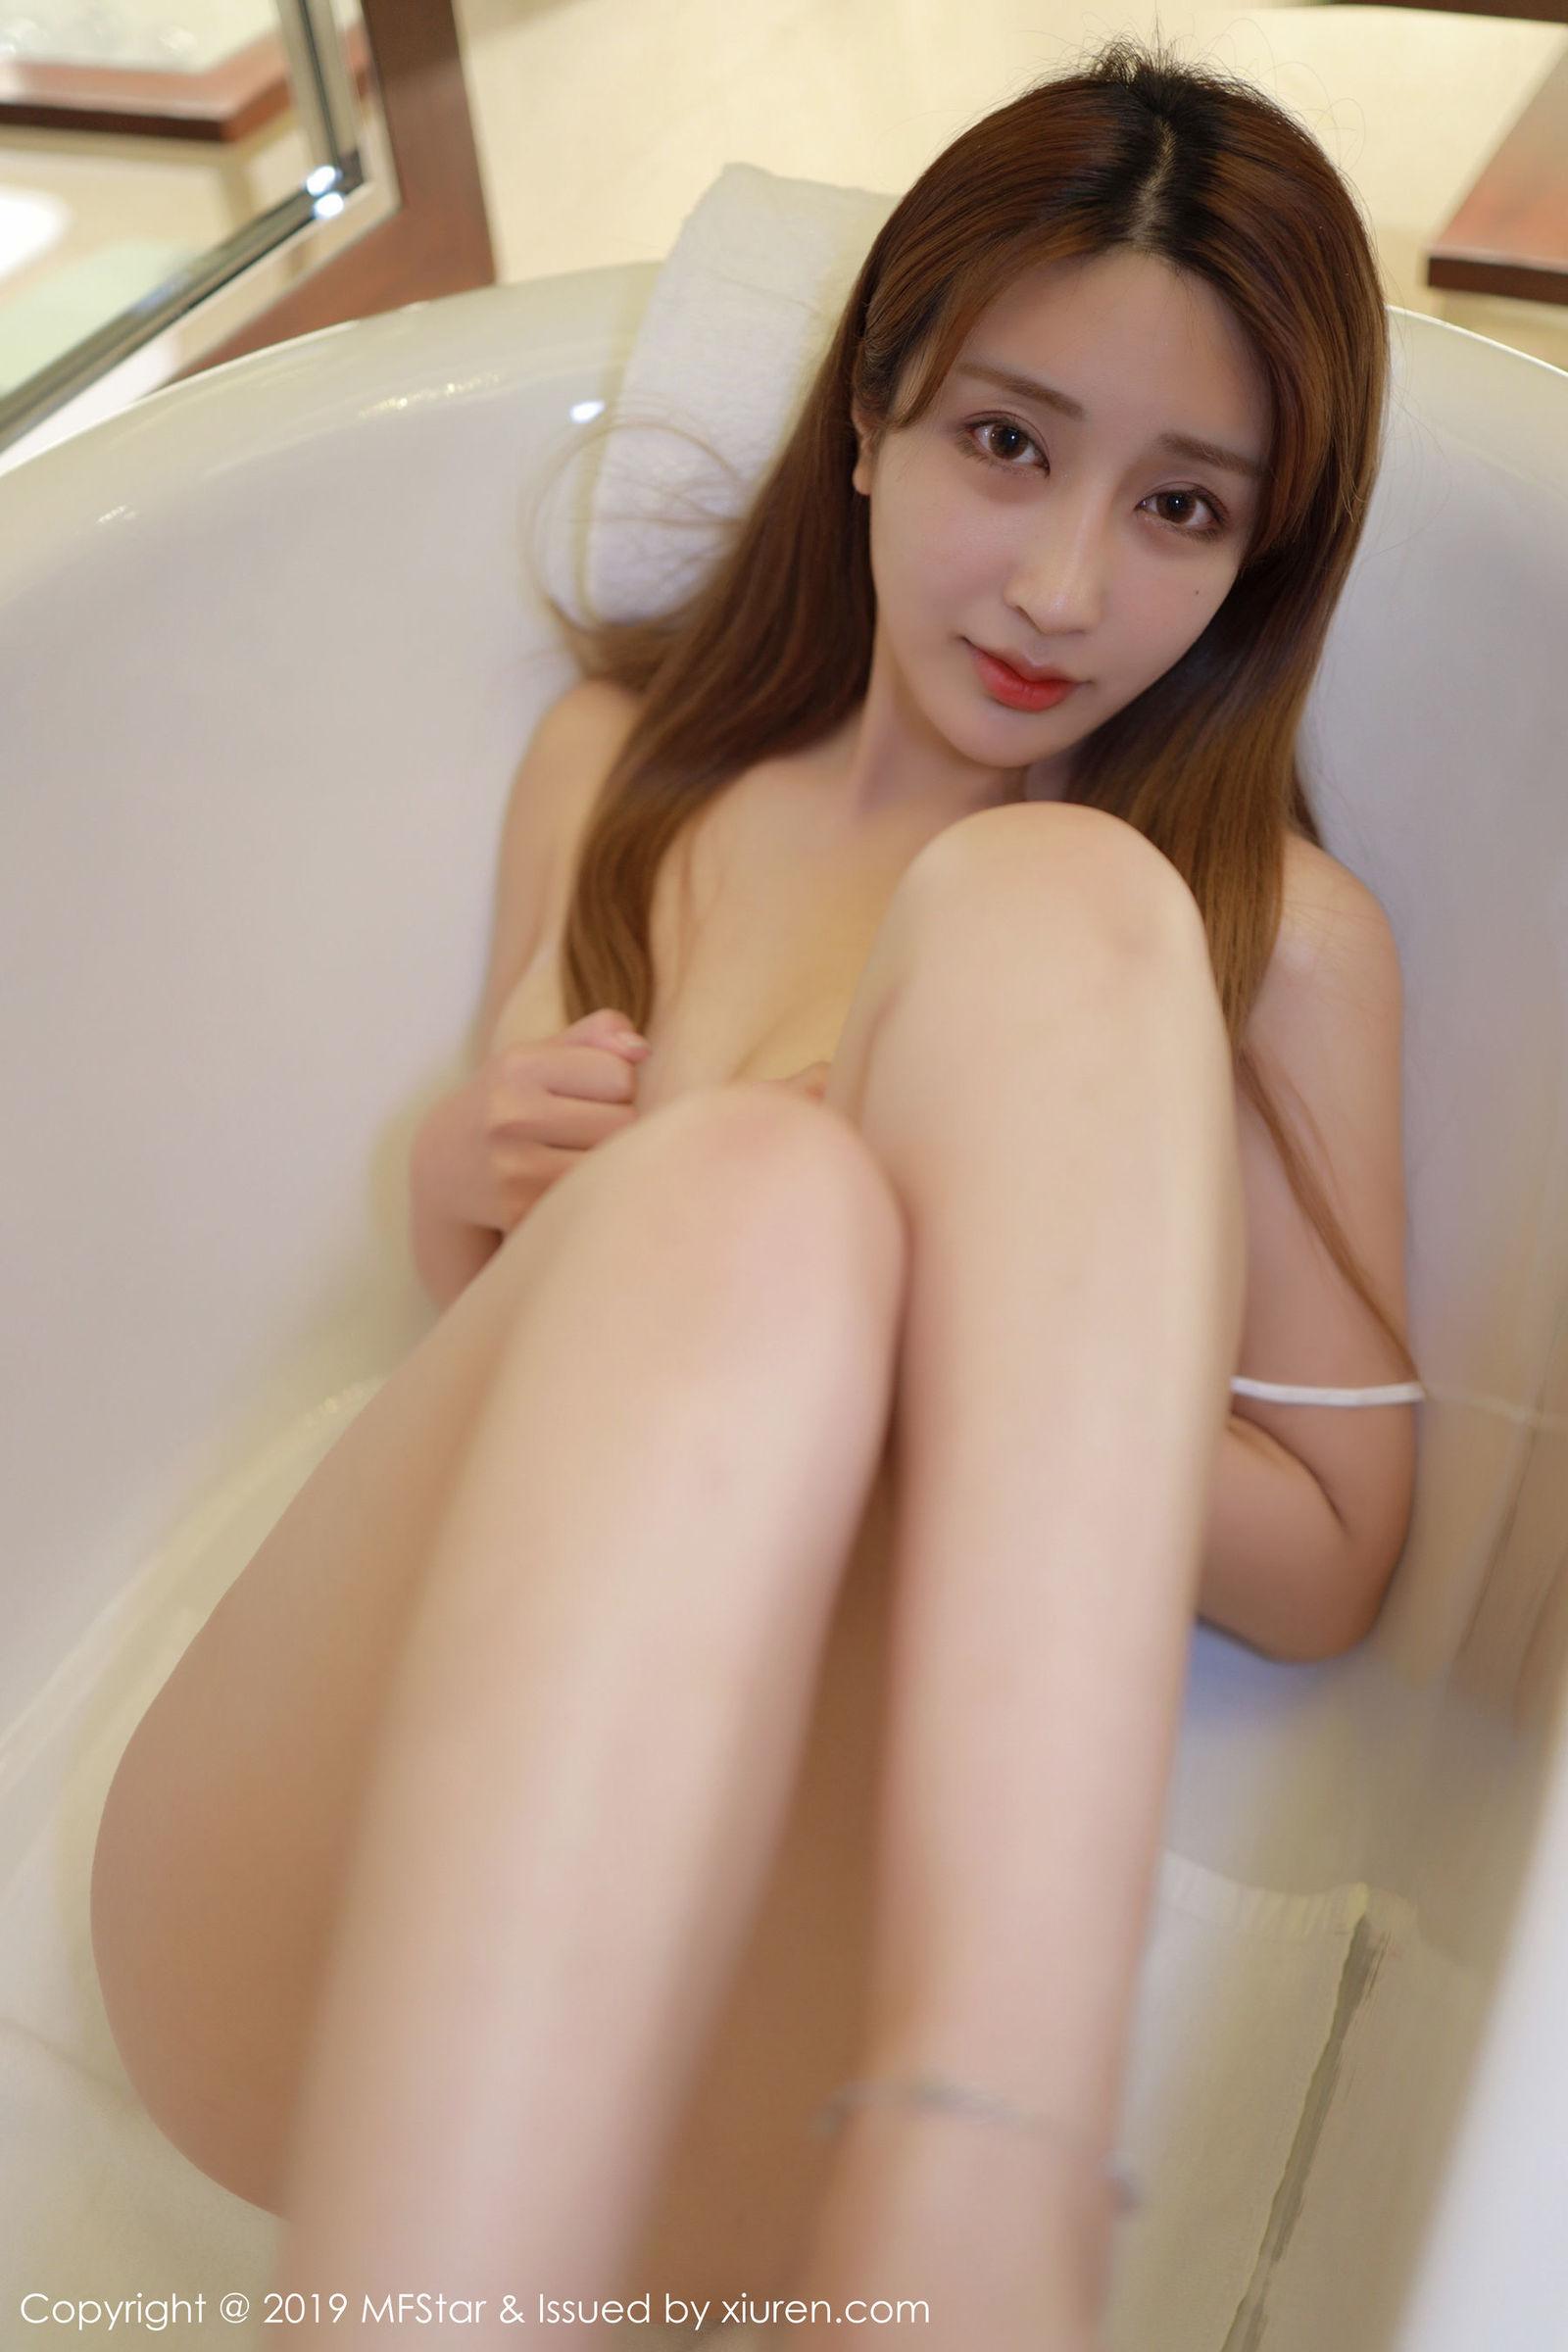 [MFStar模范学院] Vol.211 Betty林子欣 - 浴室主题的浴巾与镂空半透内衣系列[32P]